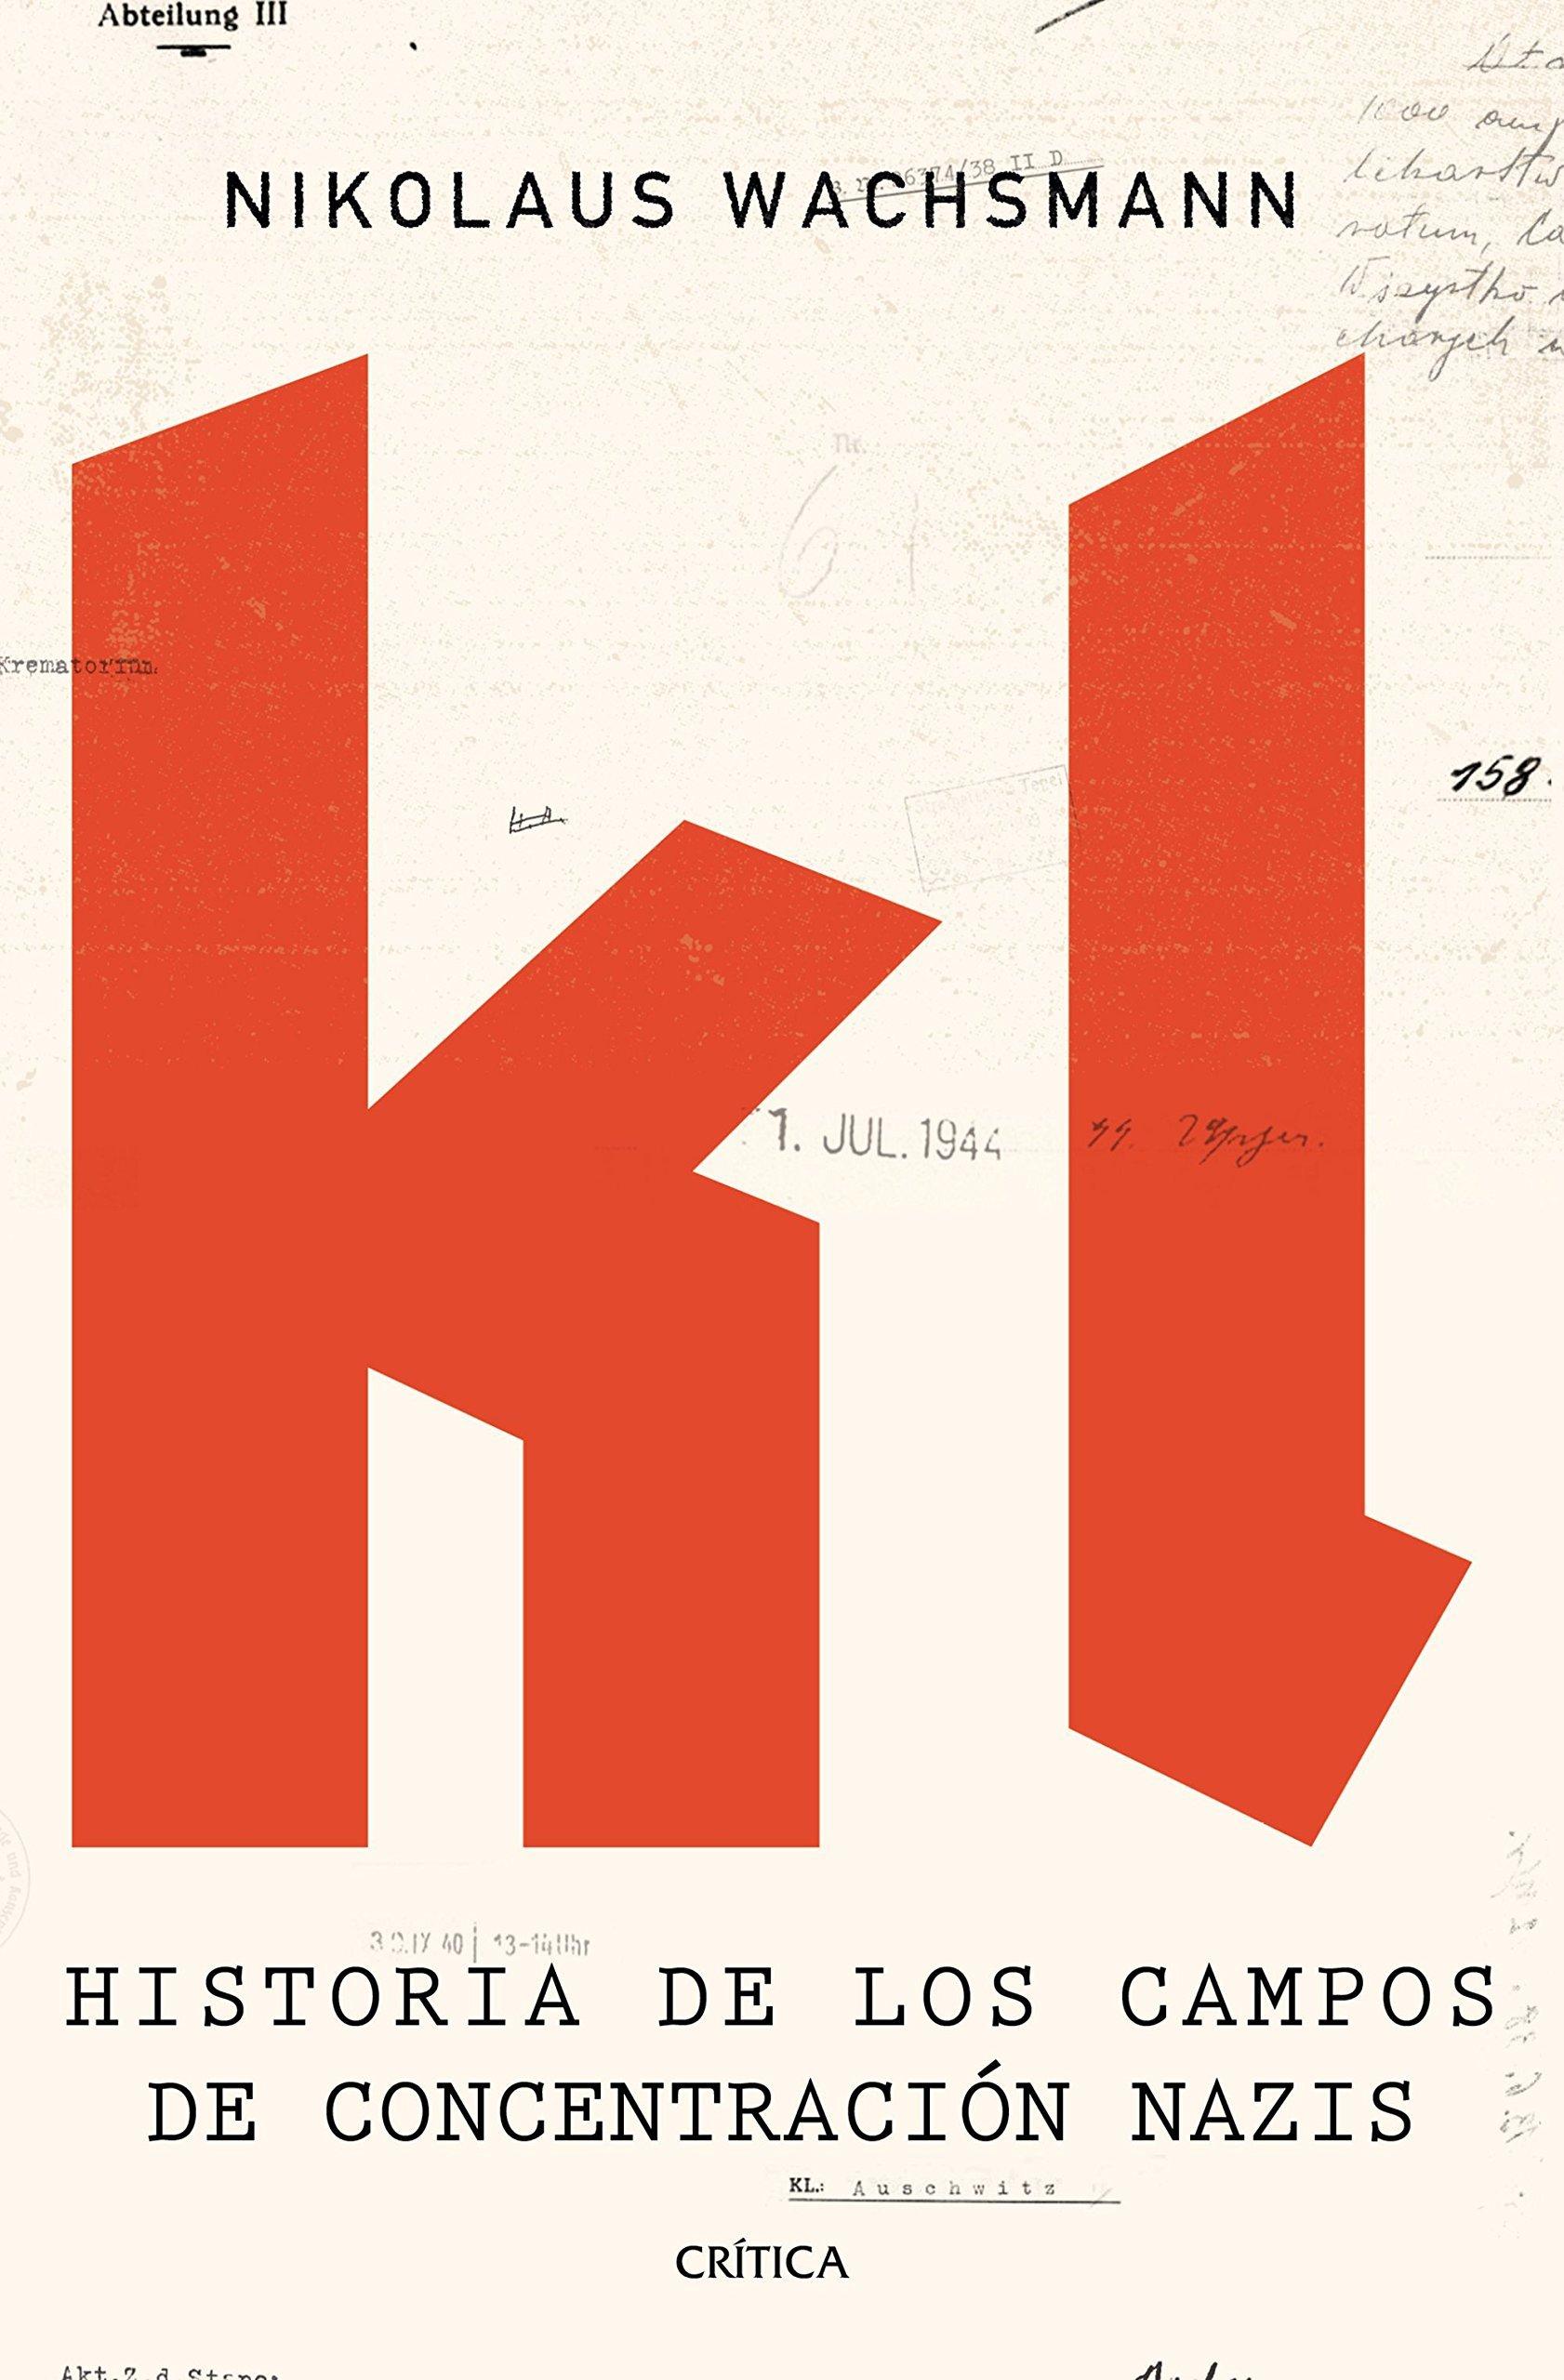 KL: Historia de los campos de concentración nazis Nikolaus Wachsmann